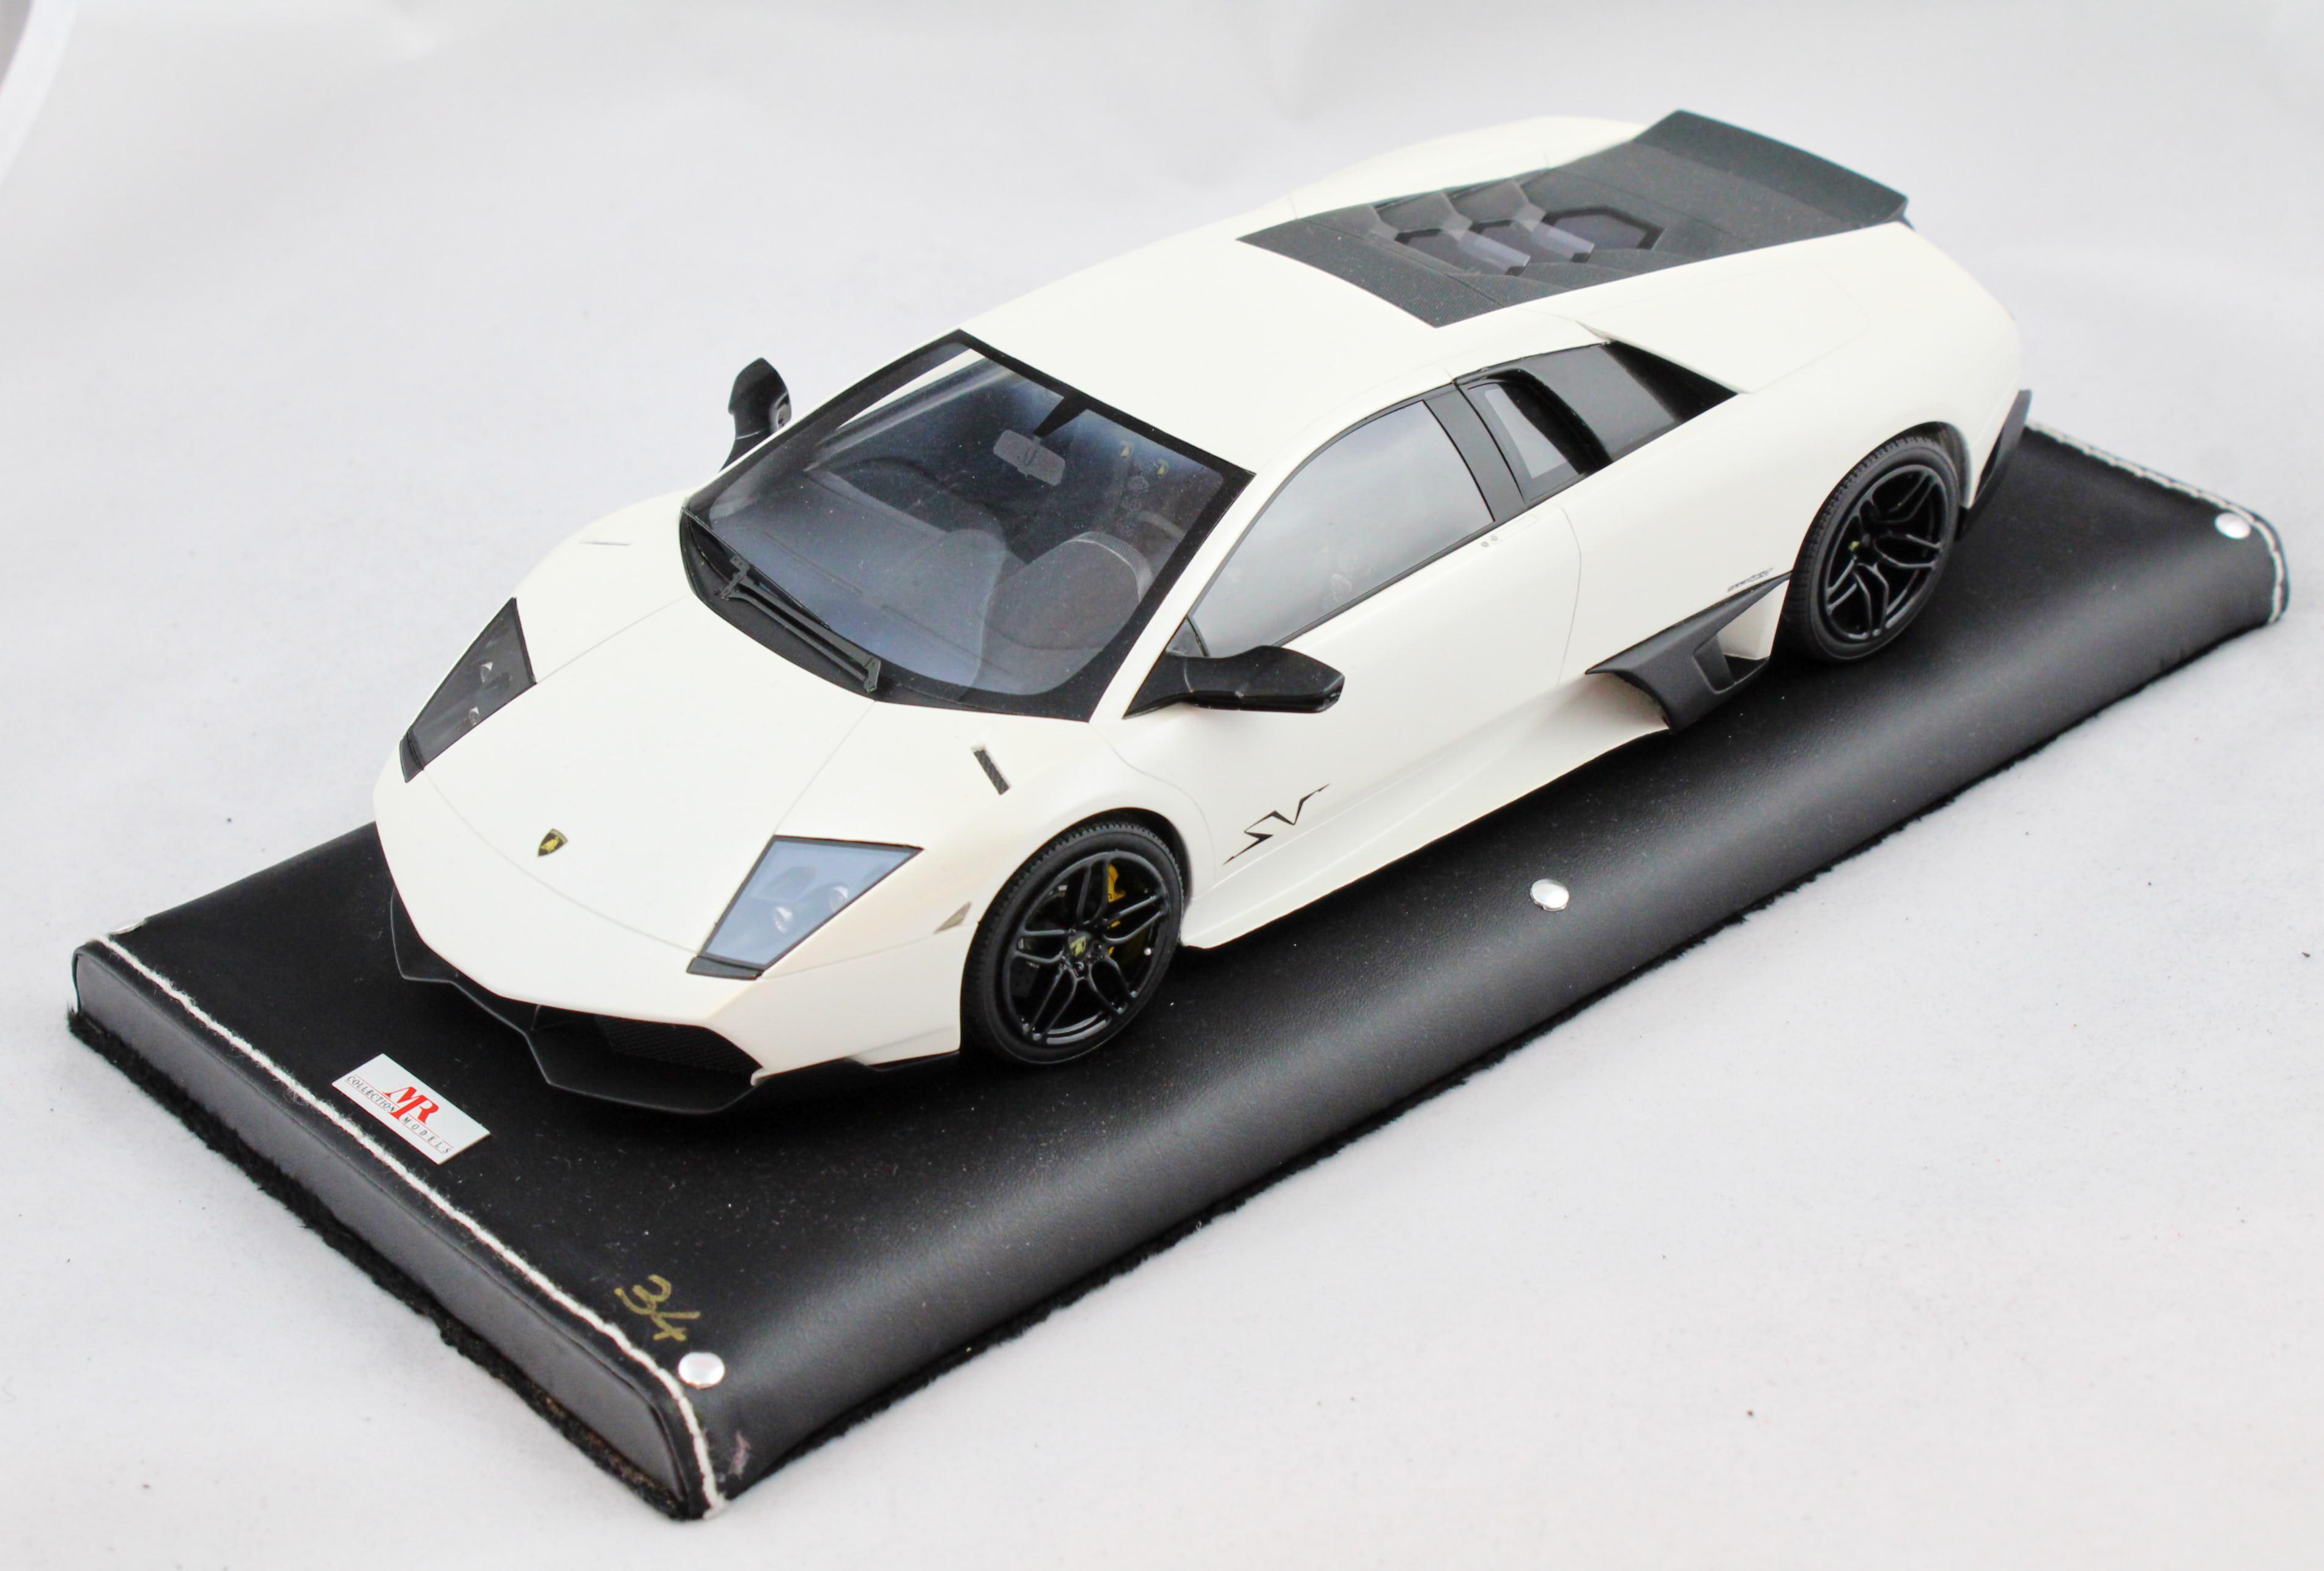 Lamborghini Murcielago Lp670-4sv Fixed Wing Canopus White 1/18